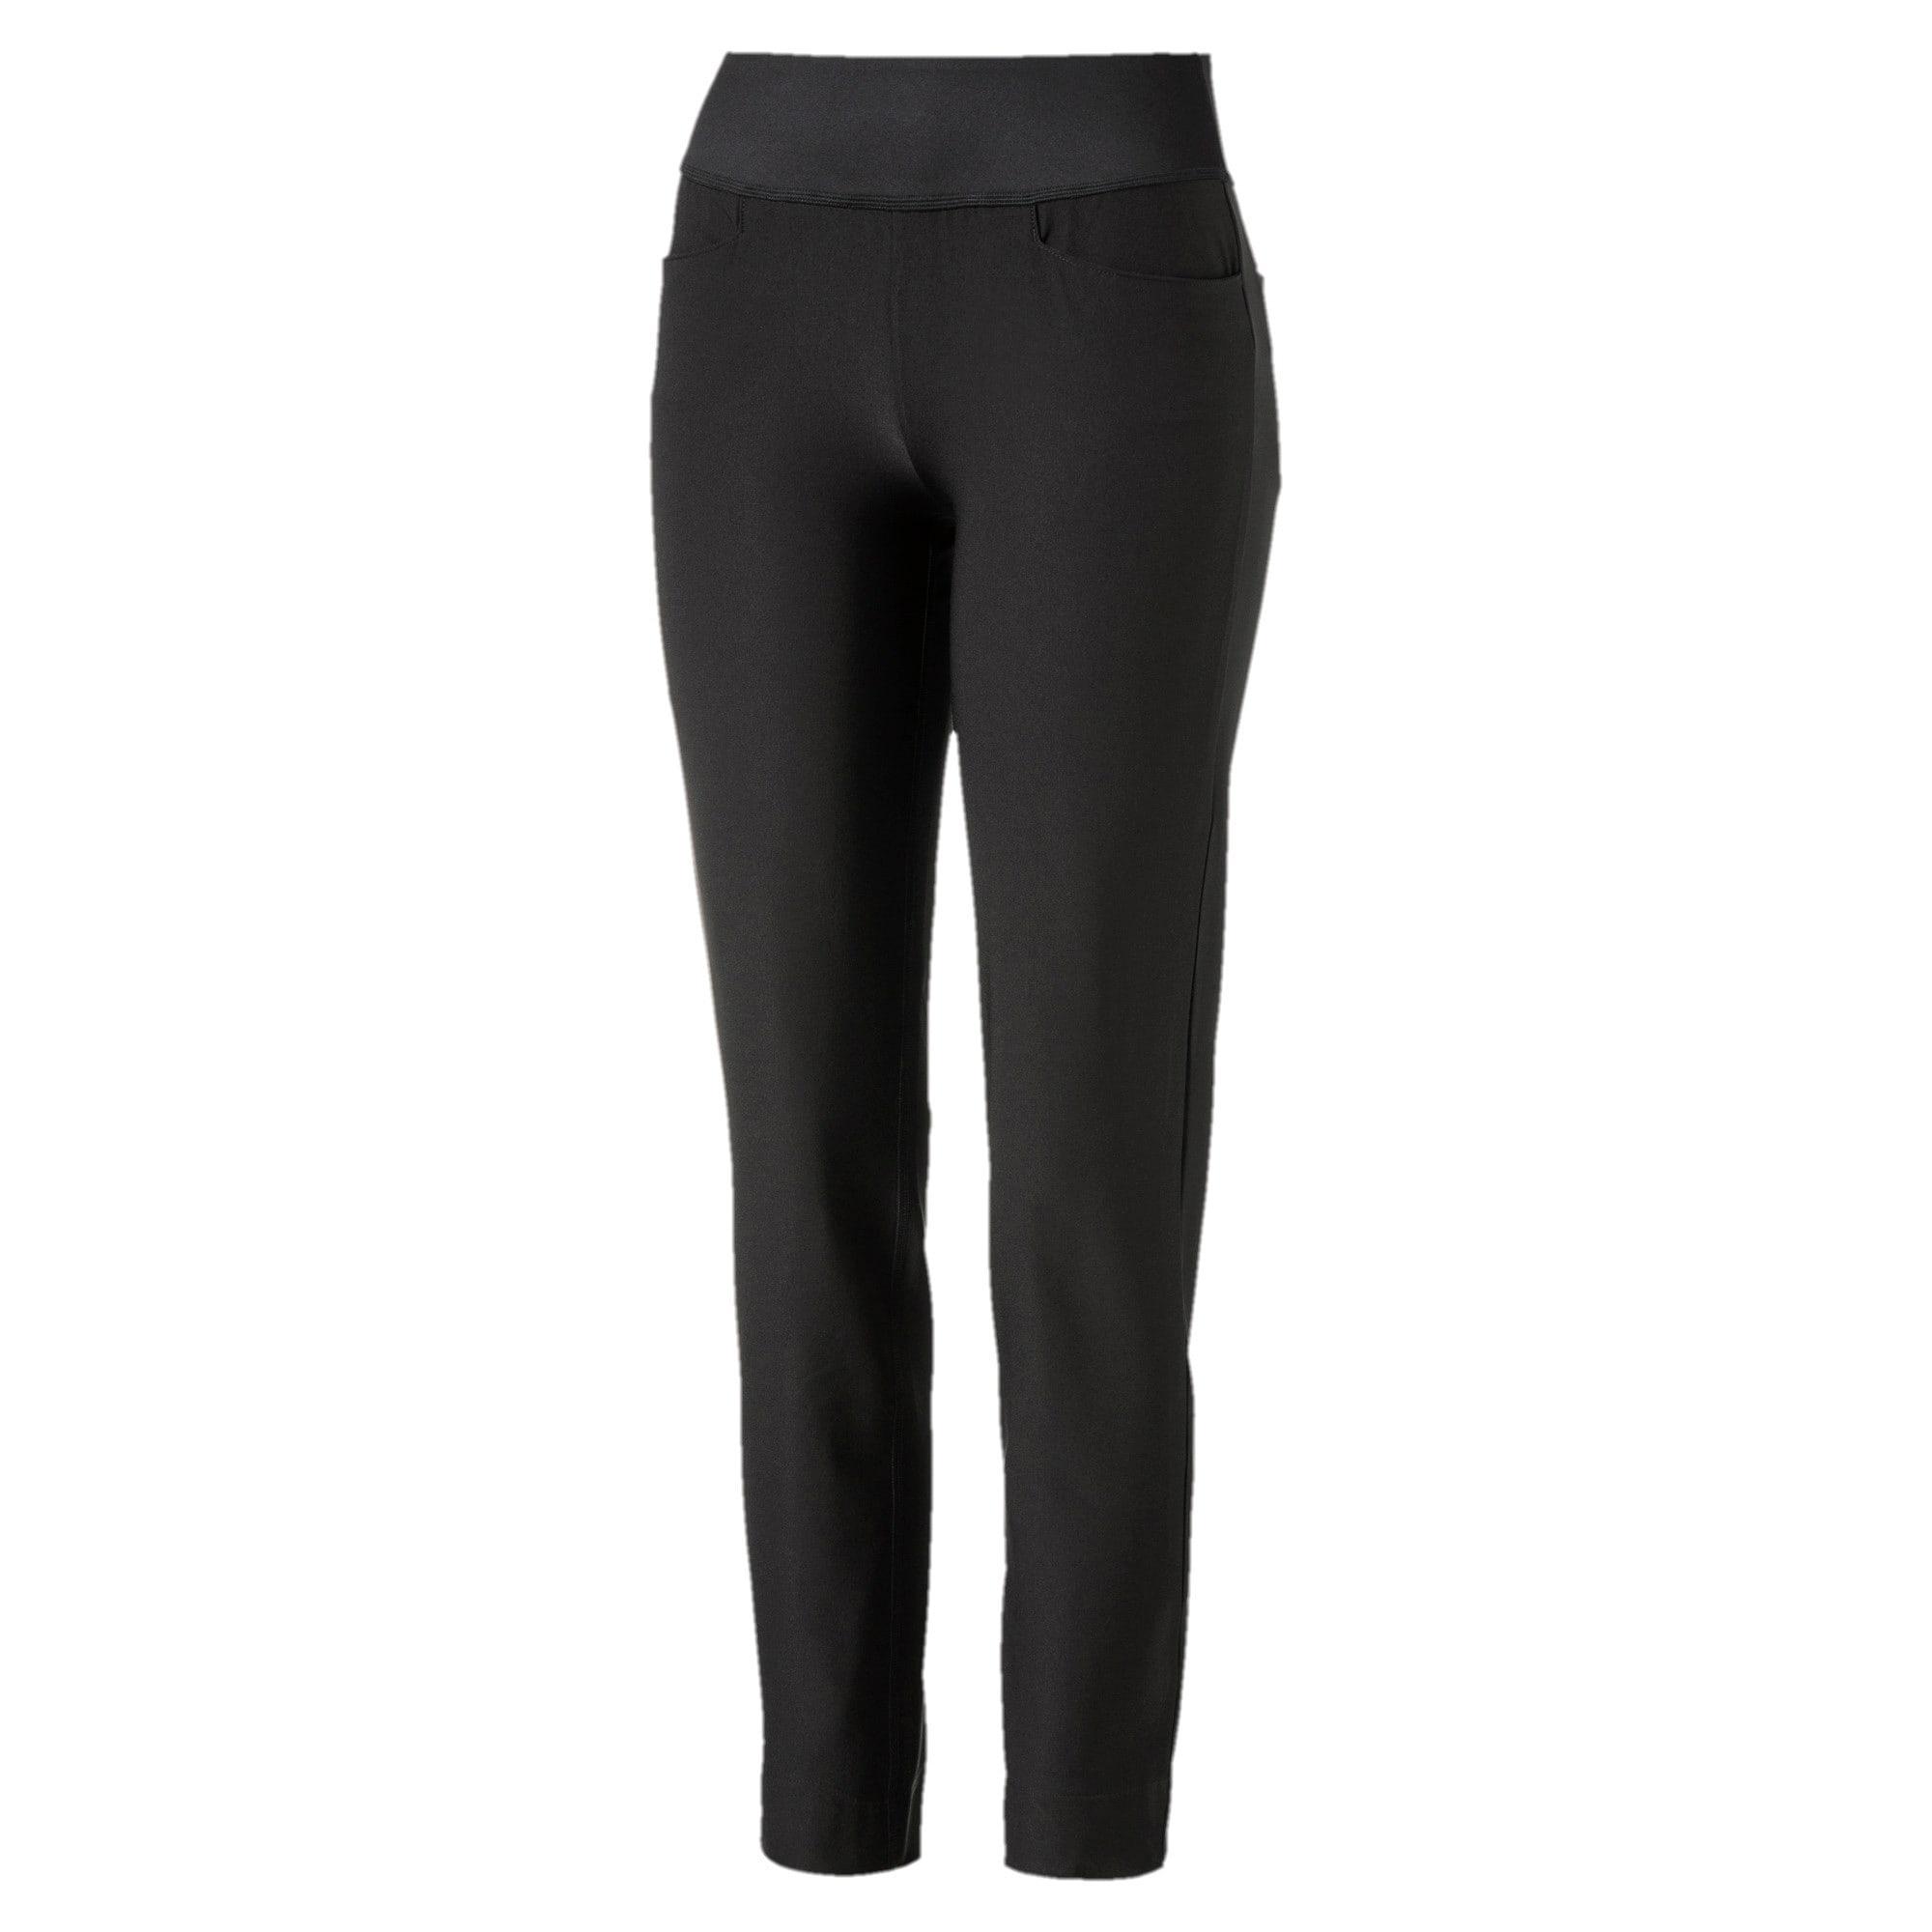 Thumbnail 4 of Golf Women's PWRSHAPE Pull On Pants, Puma Black, medium